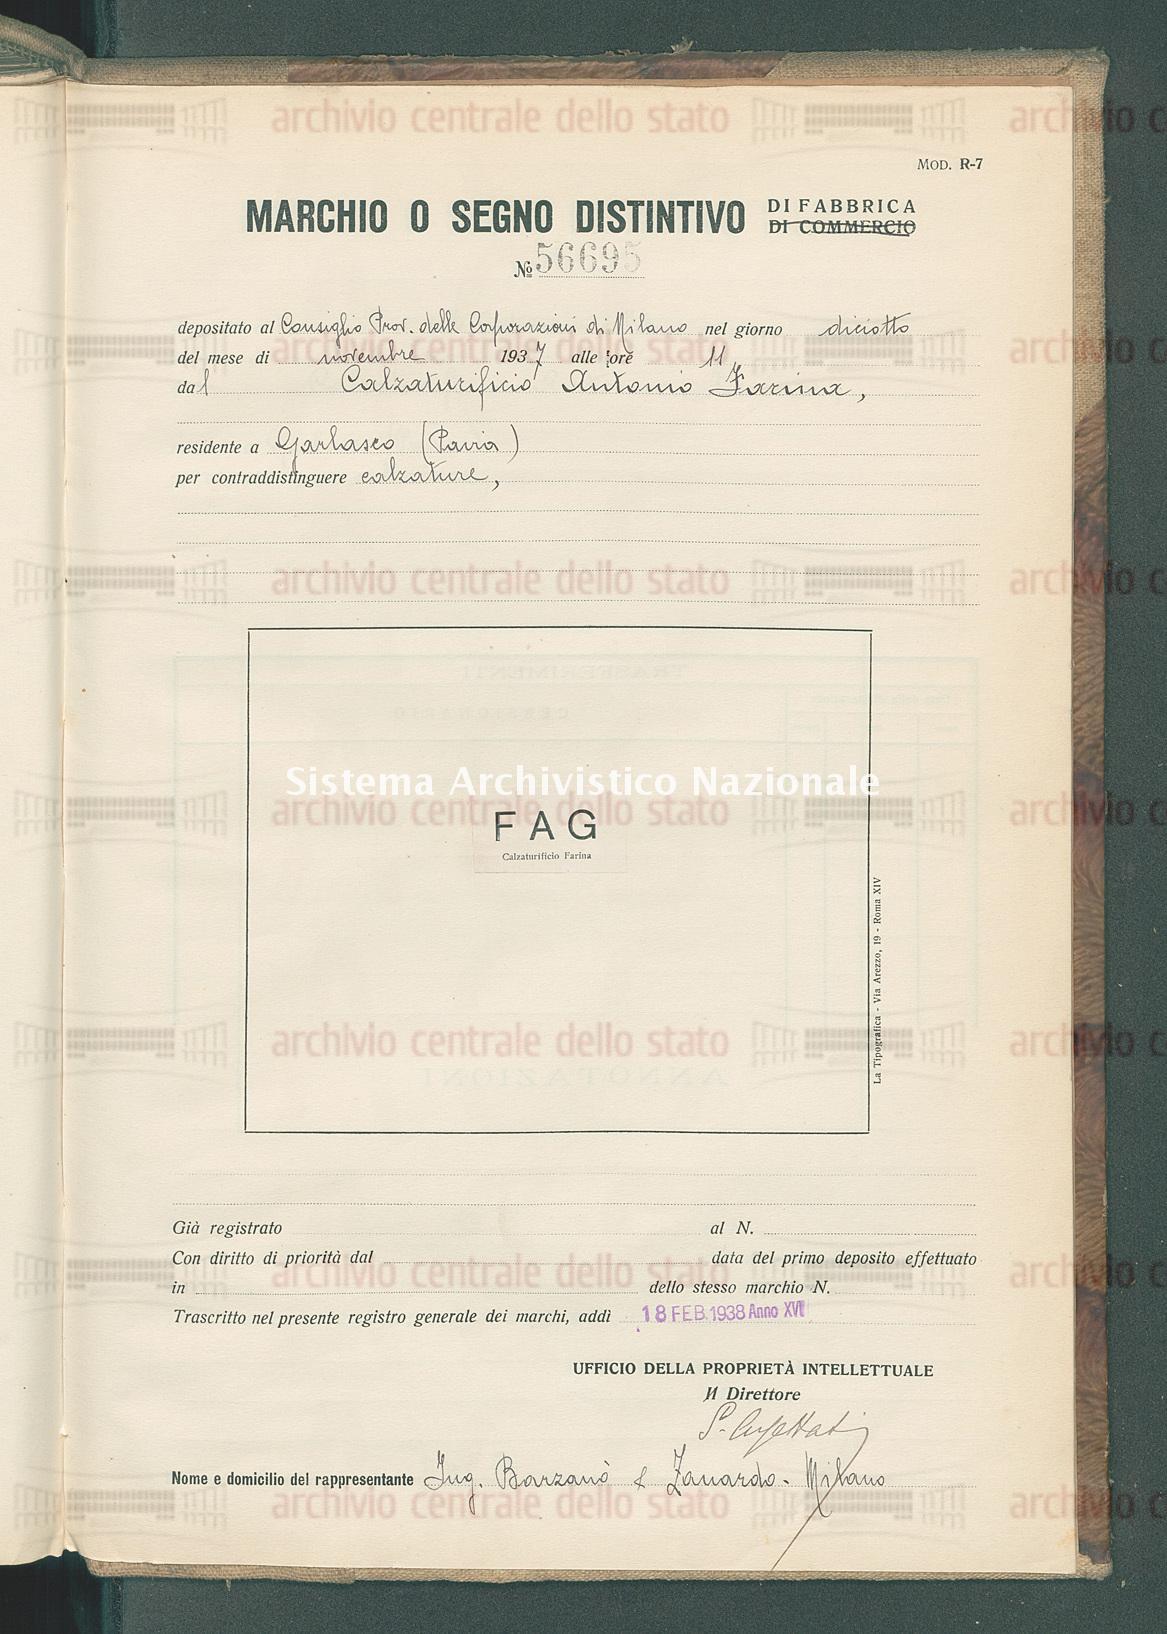 Calzature Calzaturificio Antonio Farina (18/02/1938)